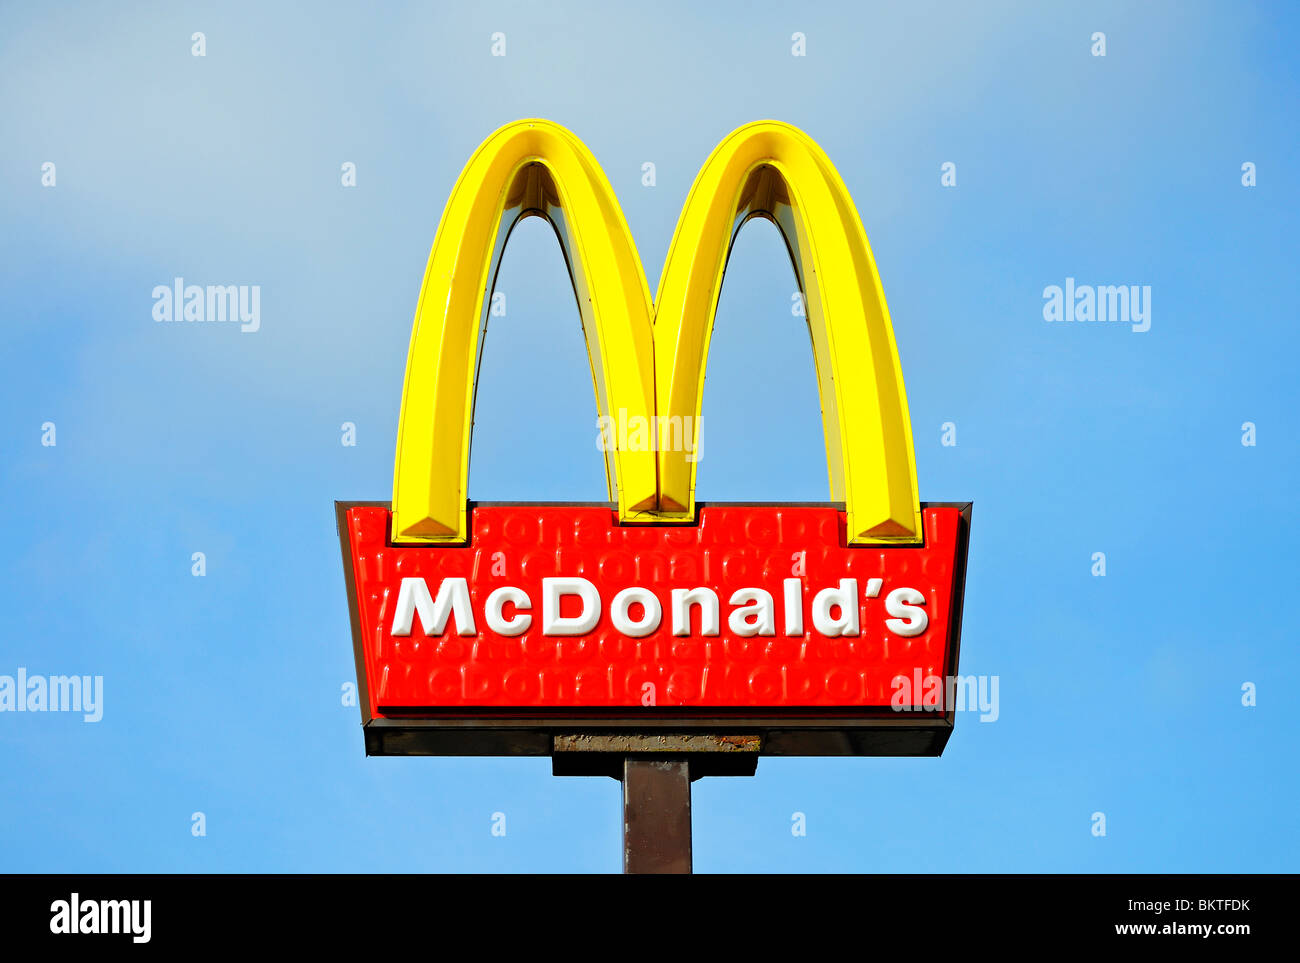 a-mcdonalds-restaurant-sign-BKTFDK.jpg